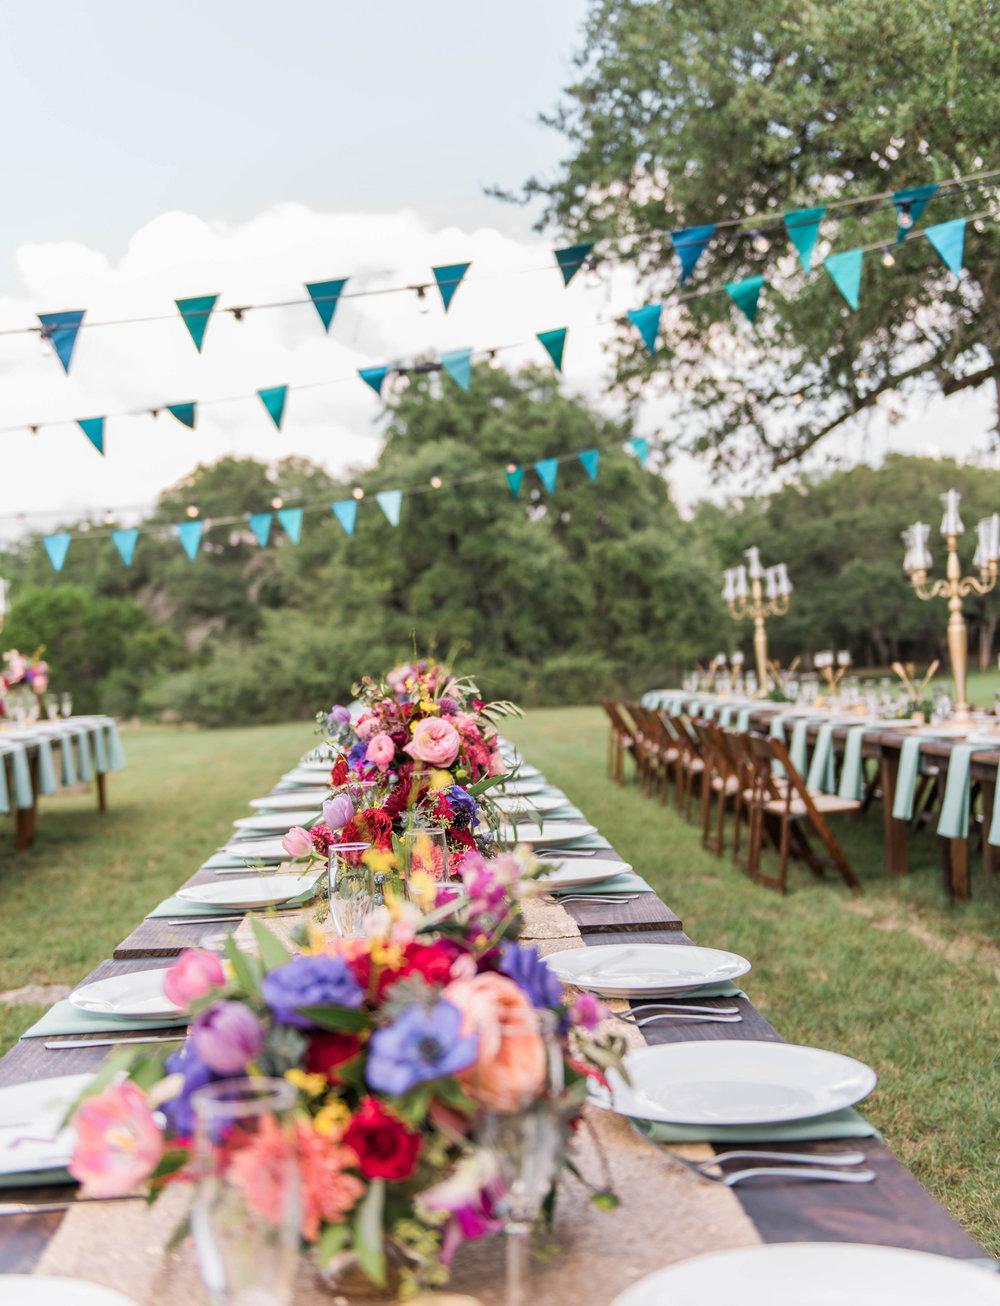 vista-west-ranch-texas-wedding-destination-austin-texas-petal-pushers-outdoor-boho-wedding